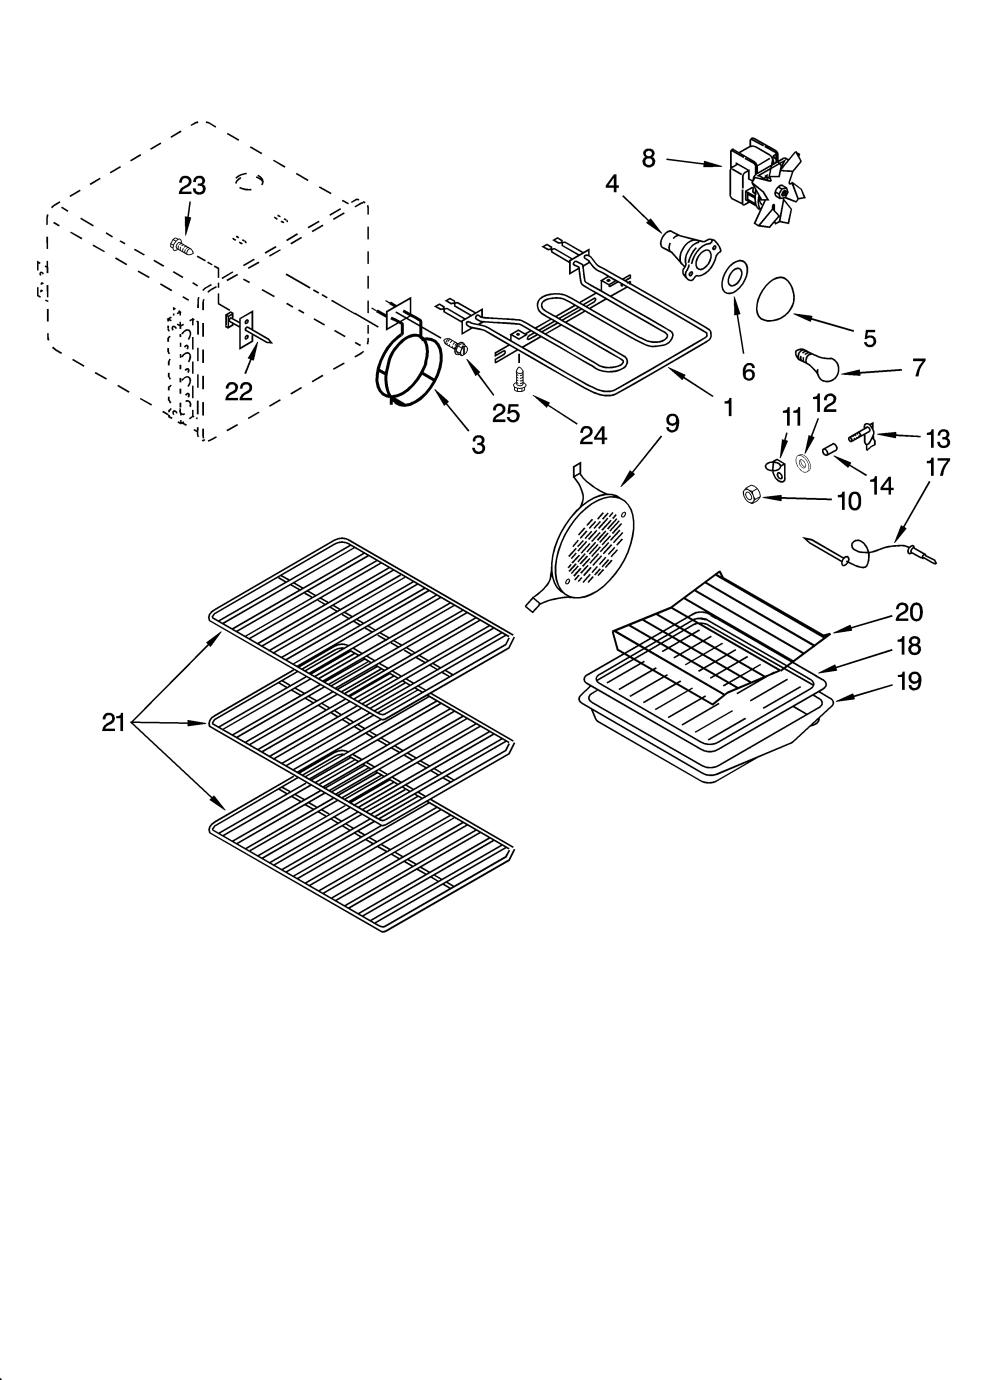 medium resolution of kitchenaid range wiring diagram